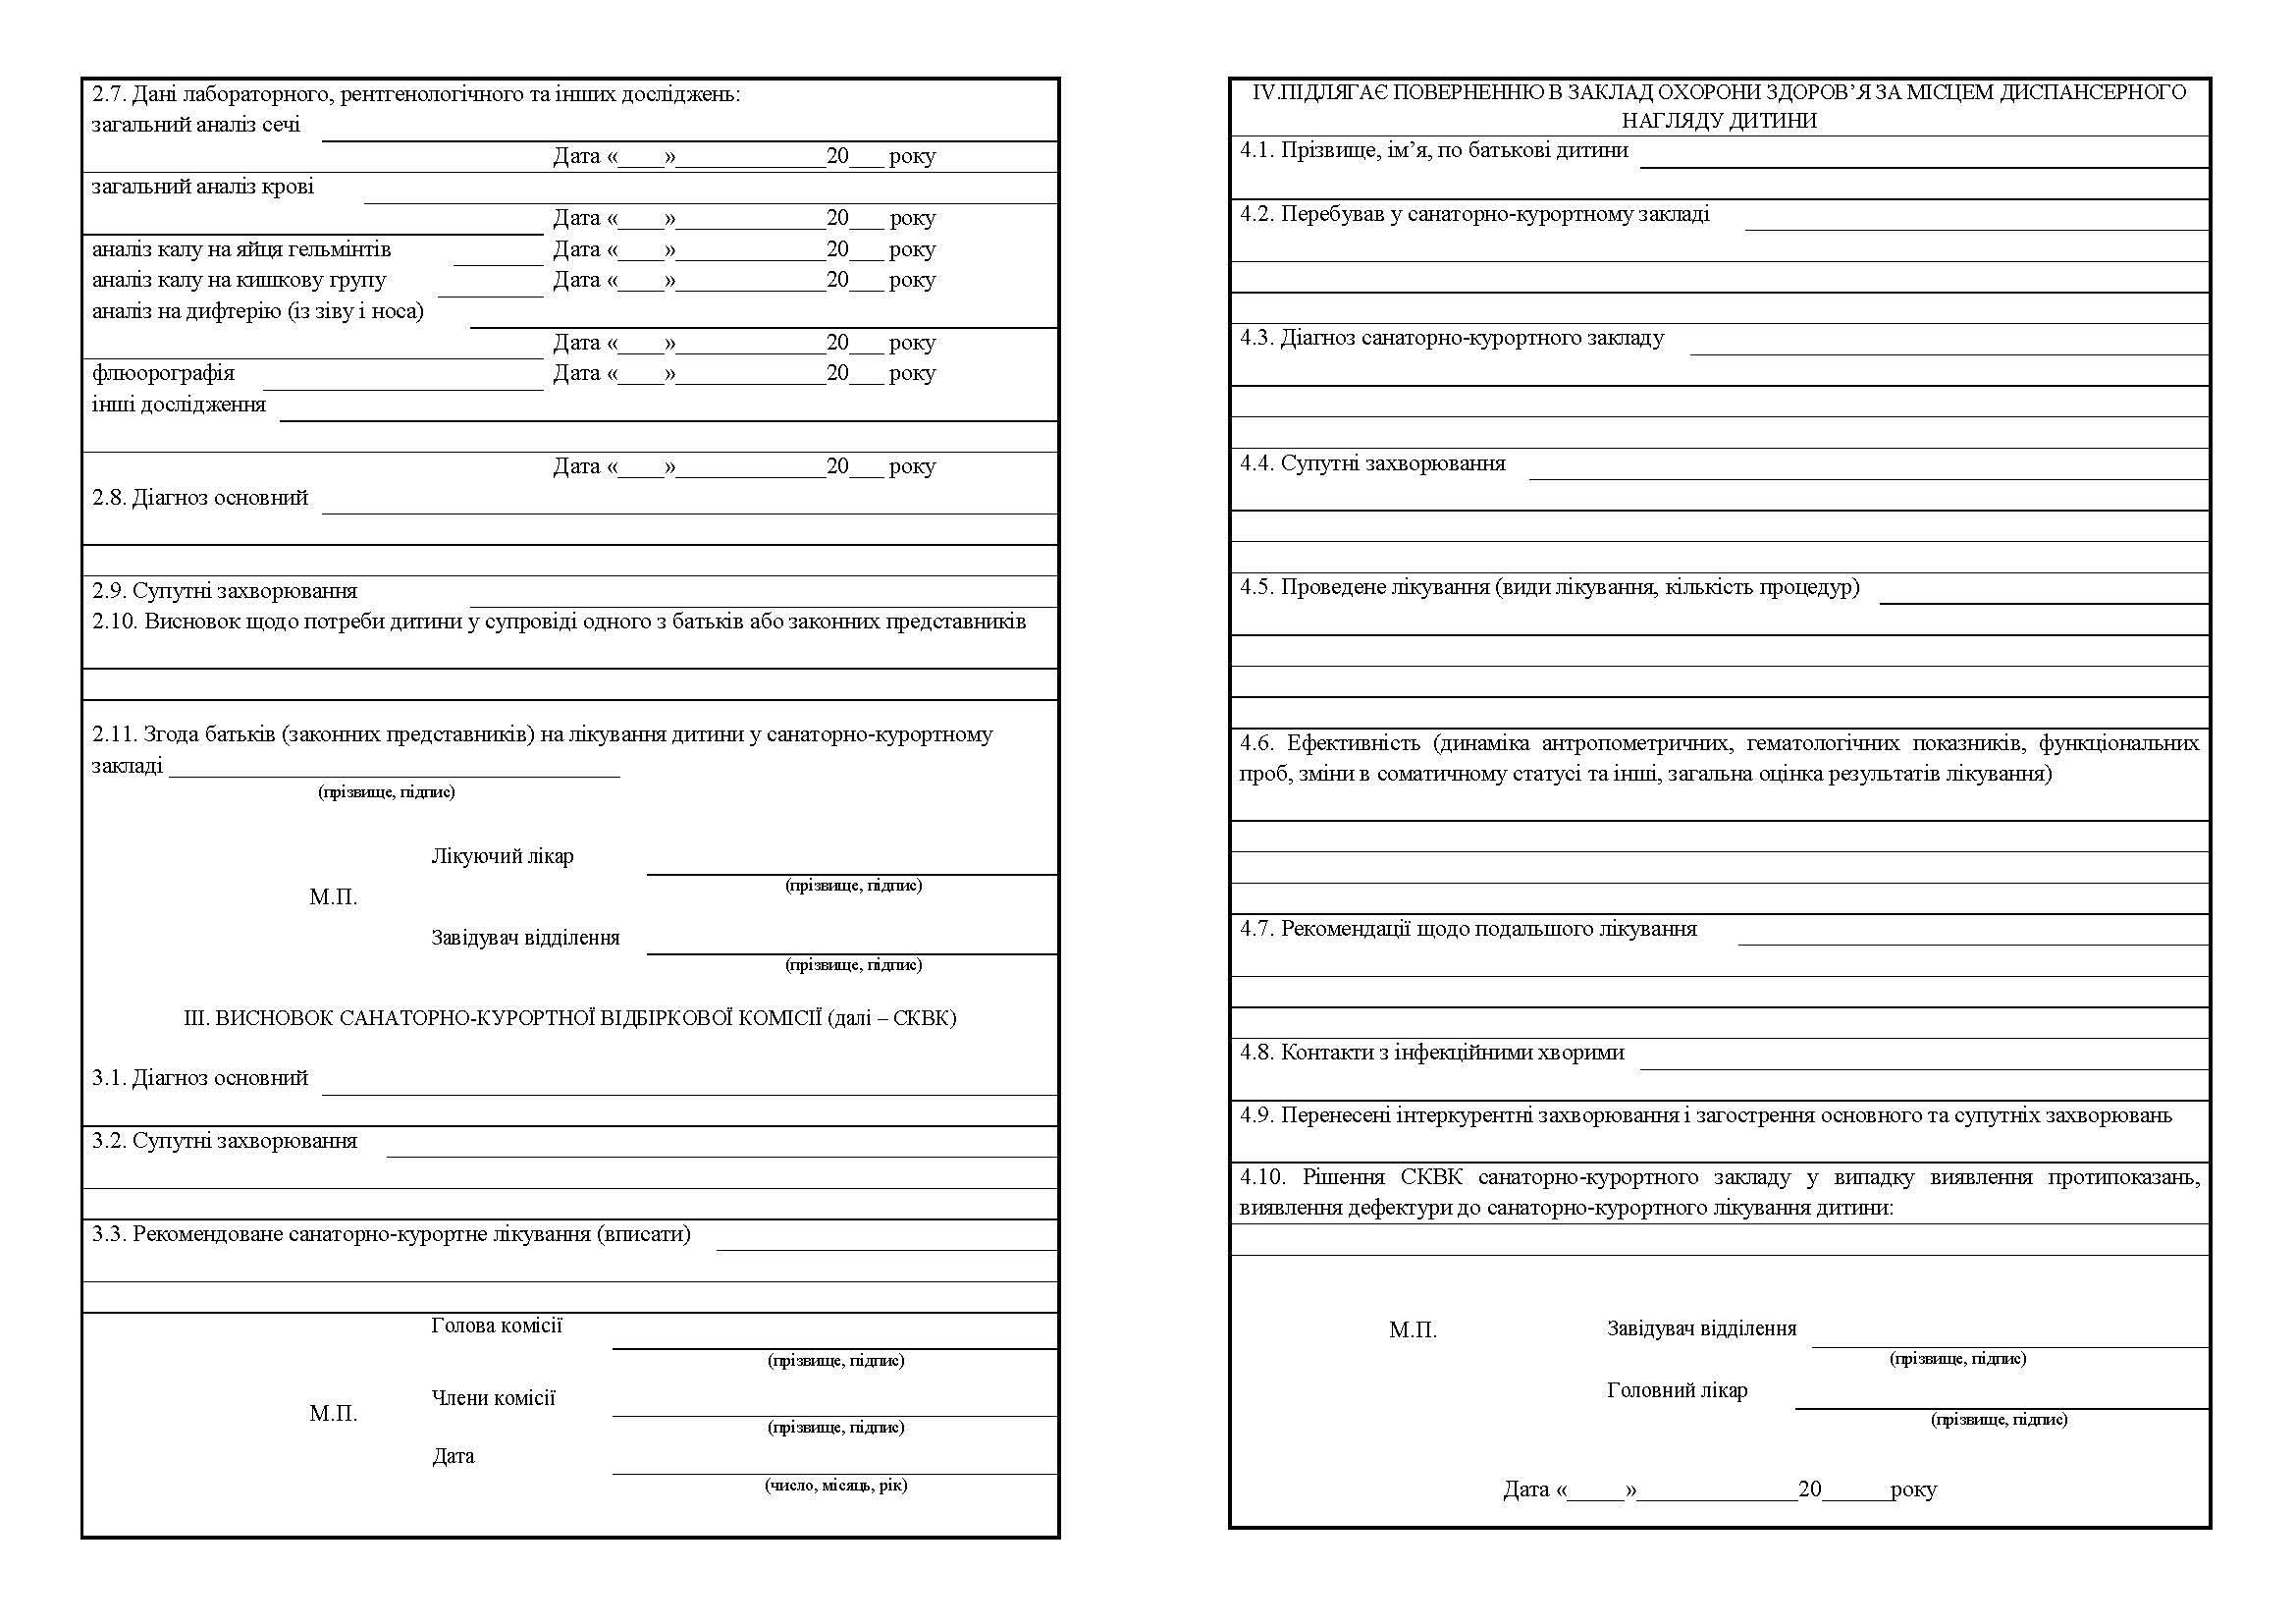 санаторно-курортная карта форма 076/0 бланк